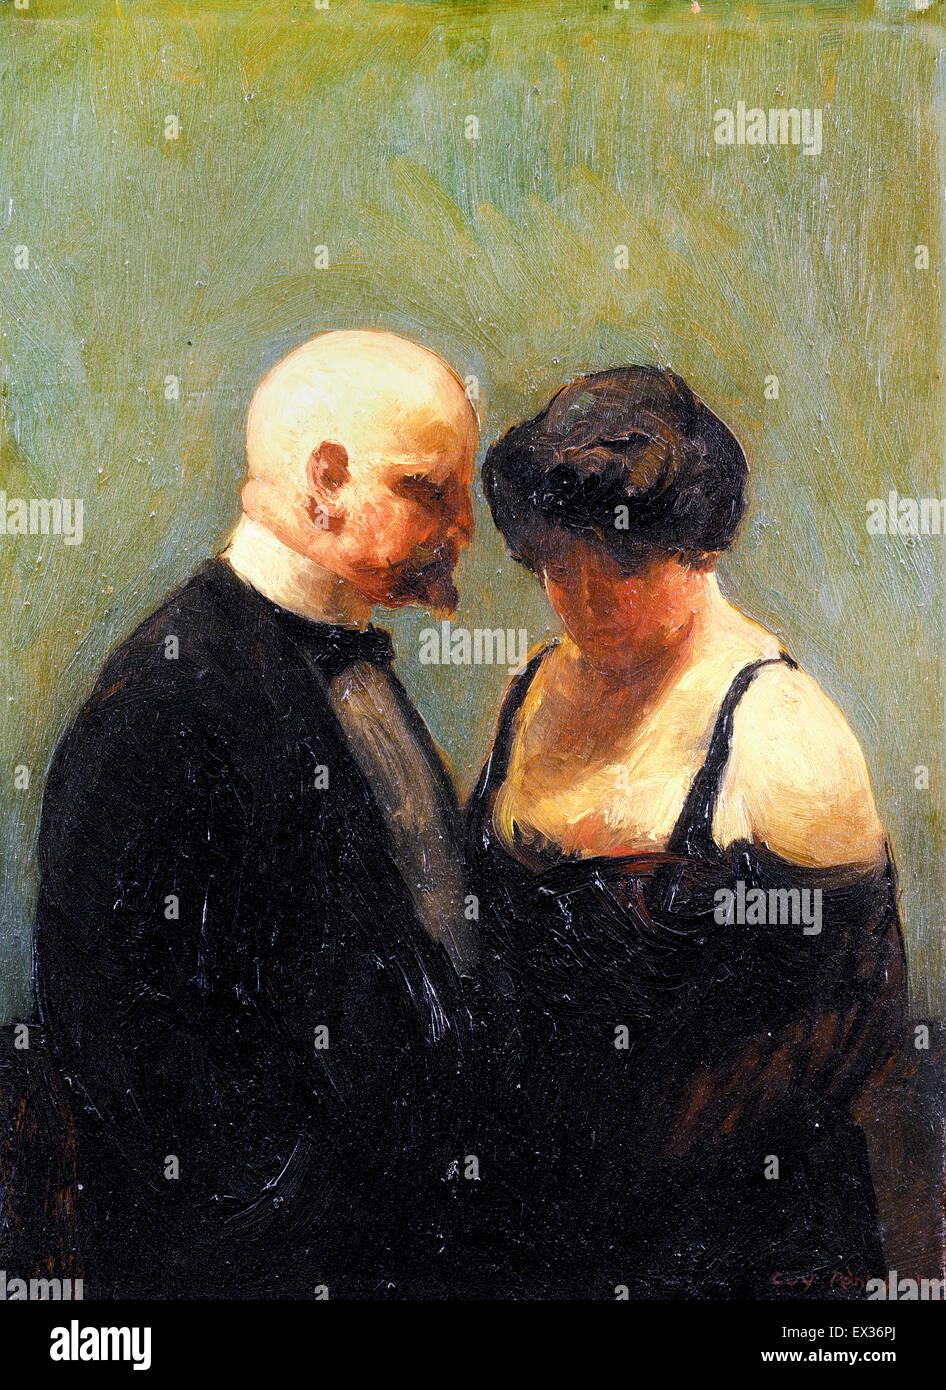 Guy Pene du Bois, The Confidence Man 1919 Oil on plywood panel. Brooklyn Museum, New York, USA. - Stock Image